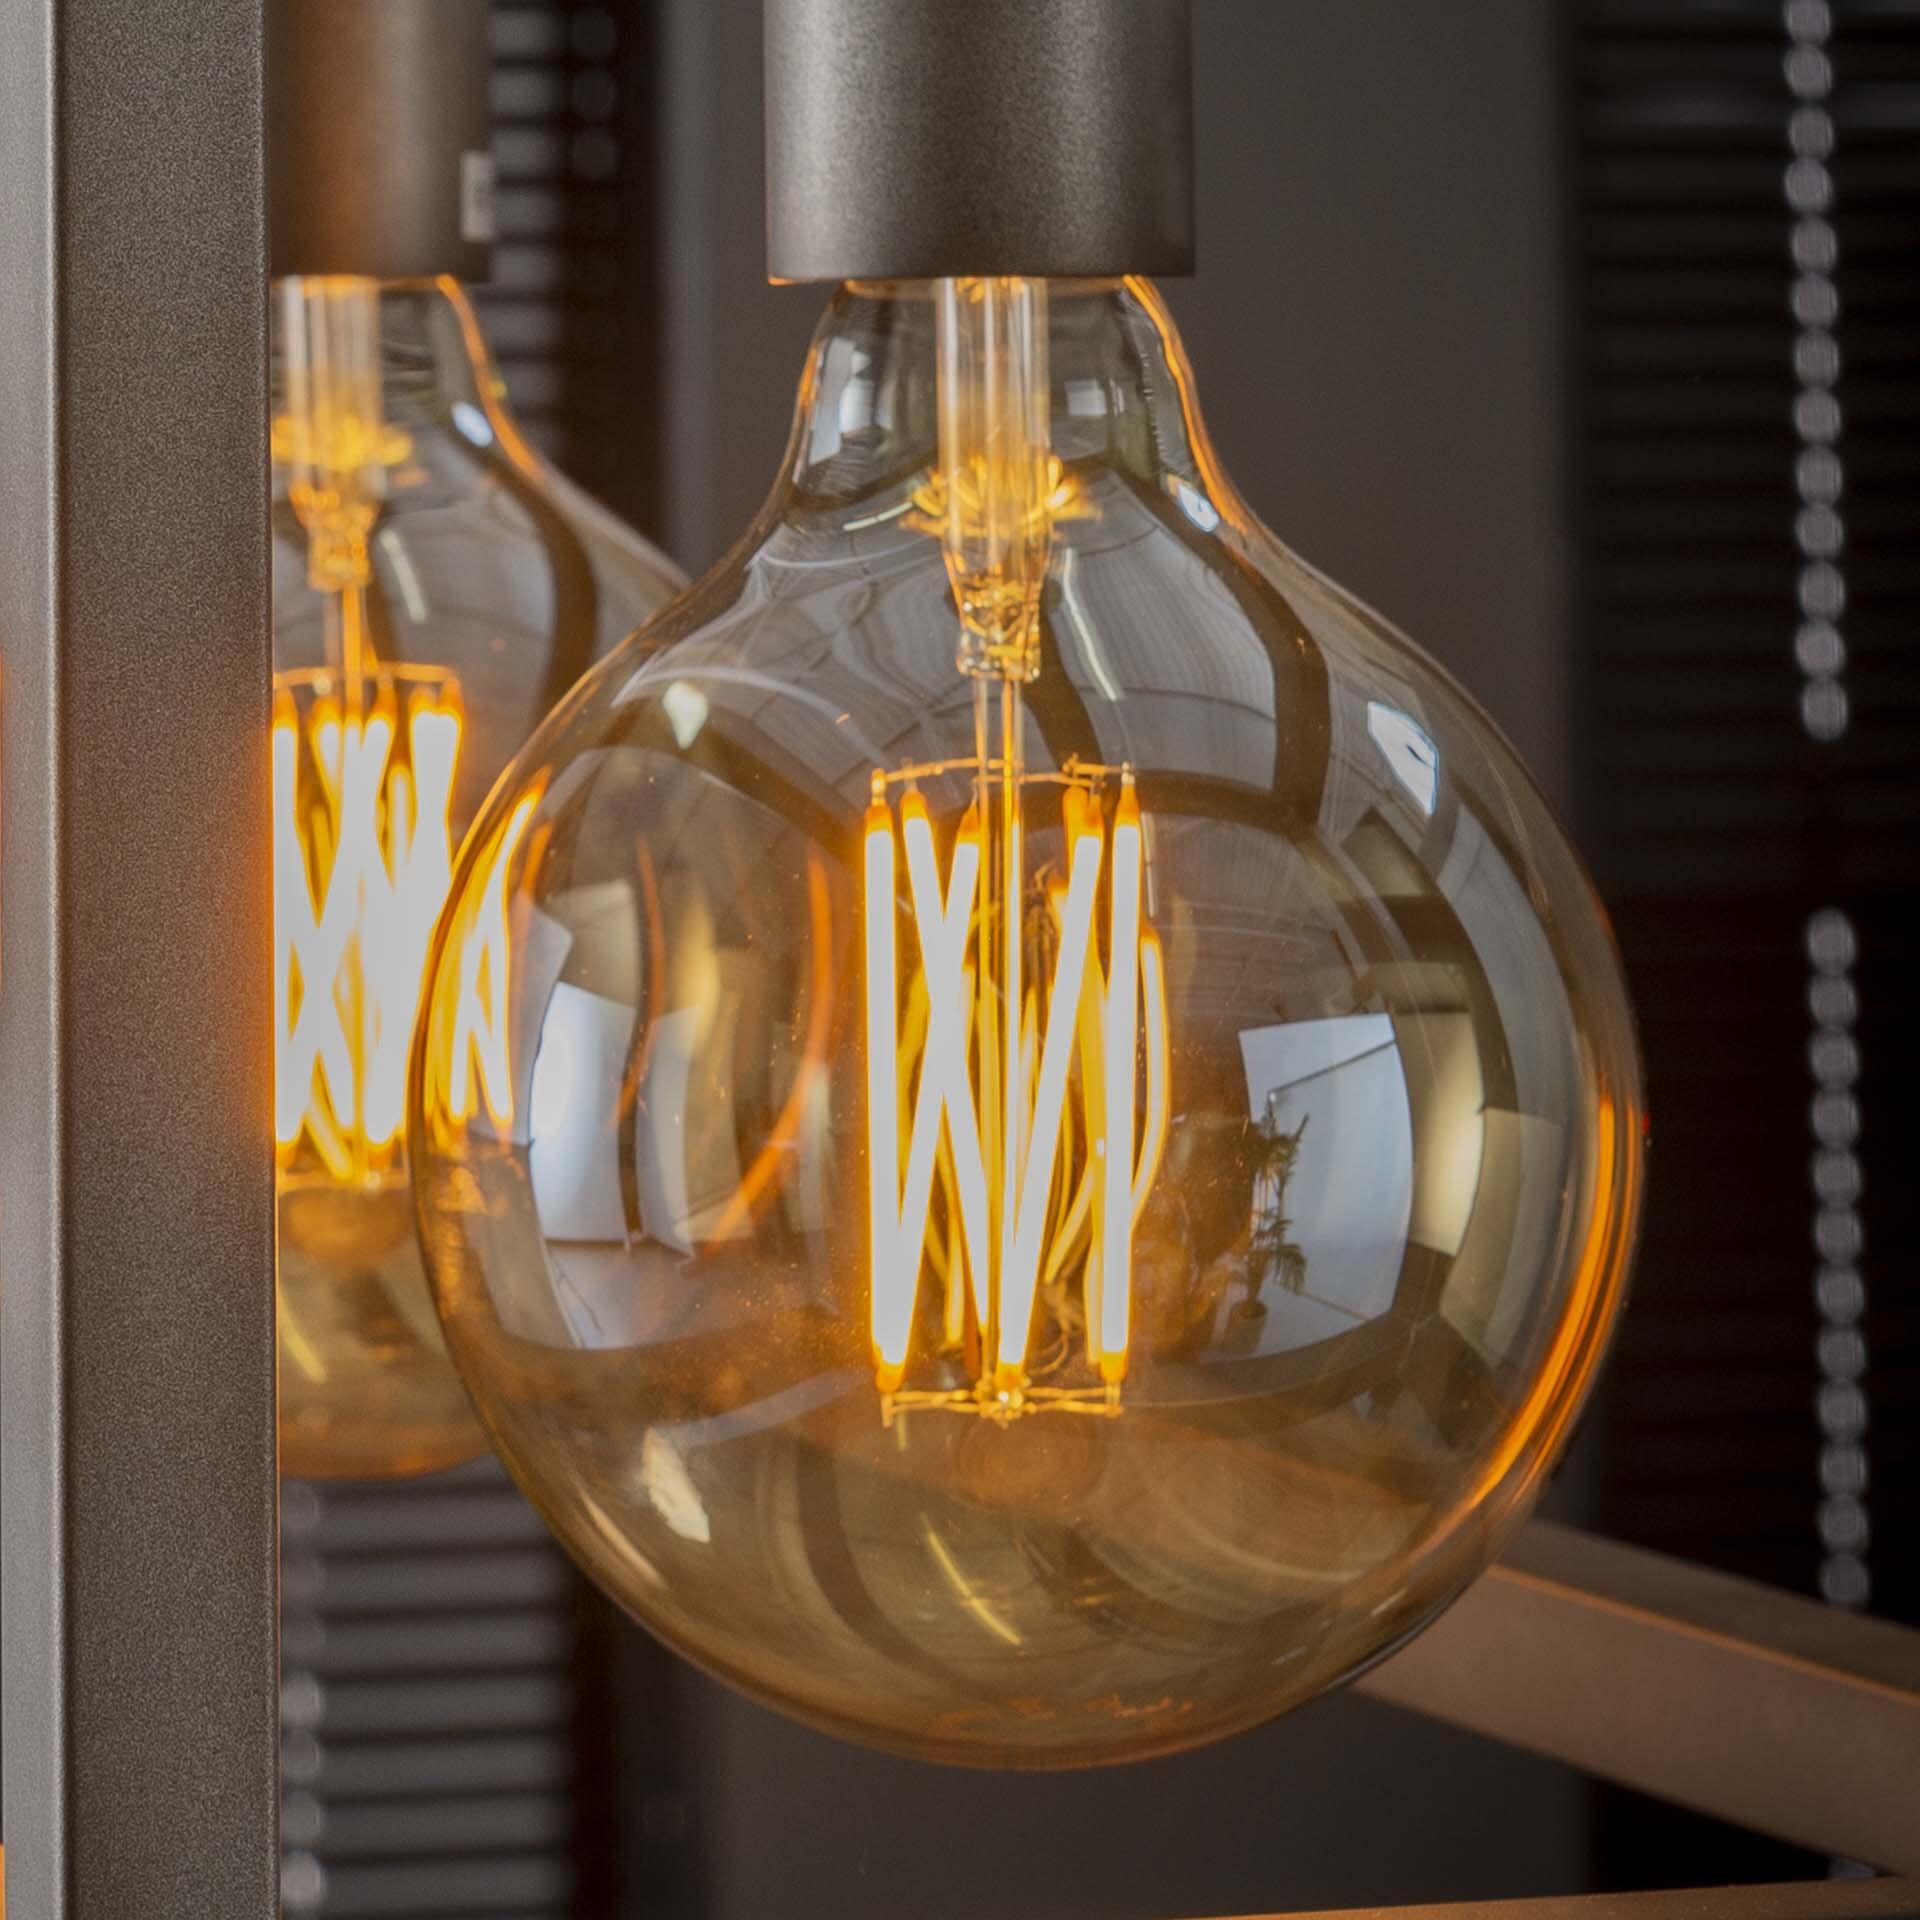 Kooldraadlamp 'Bol XL' E27 LED 6W goldline Ø12,5cm, dimbaar | LifestyleFurn